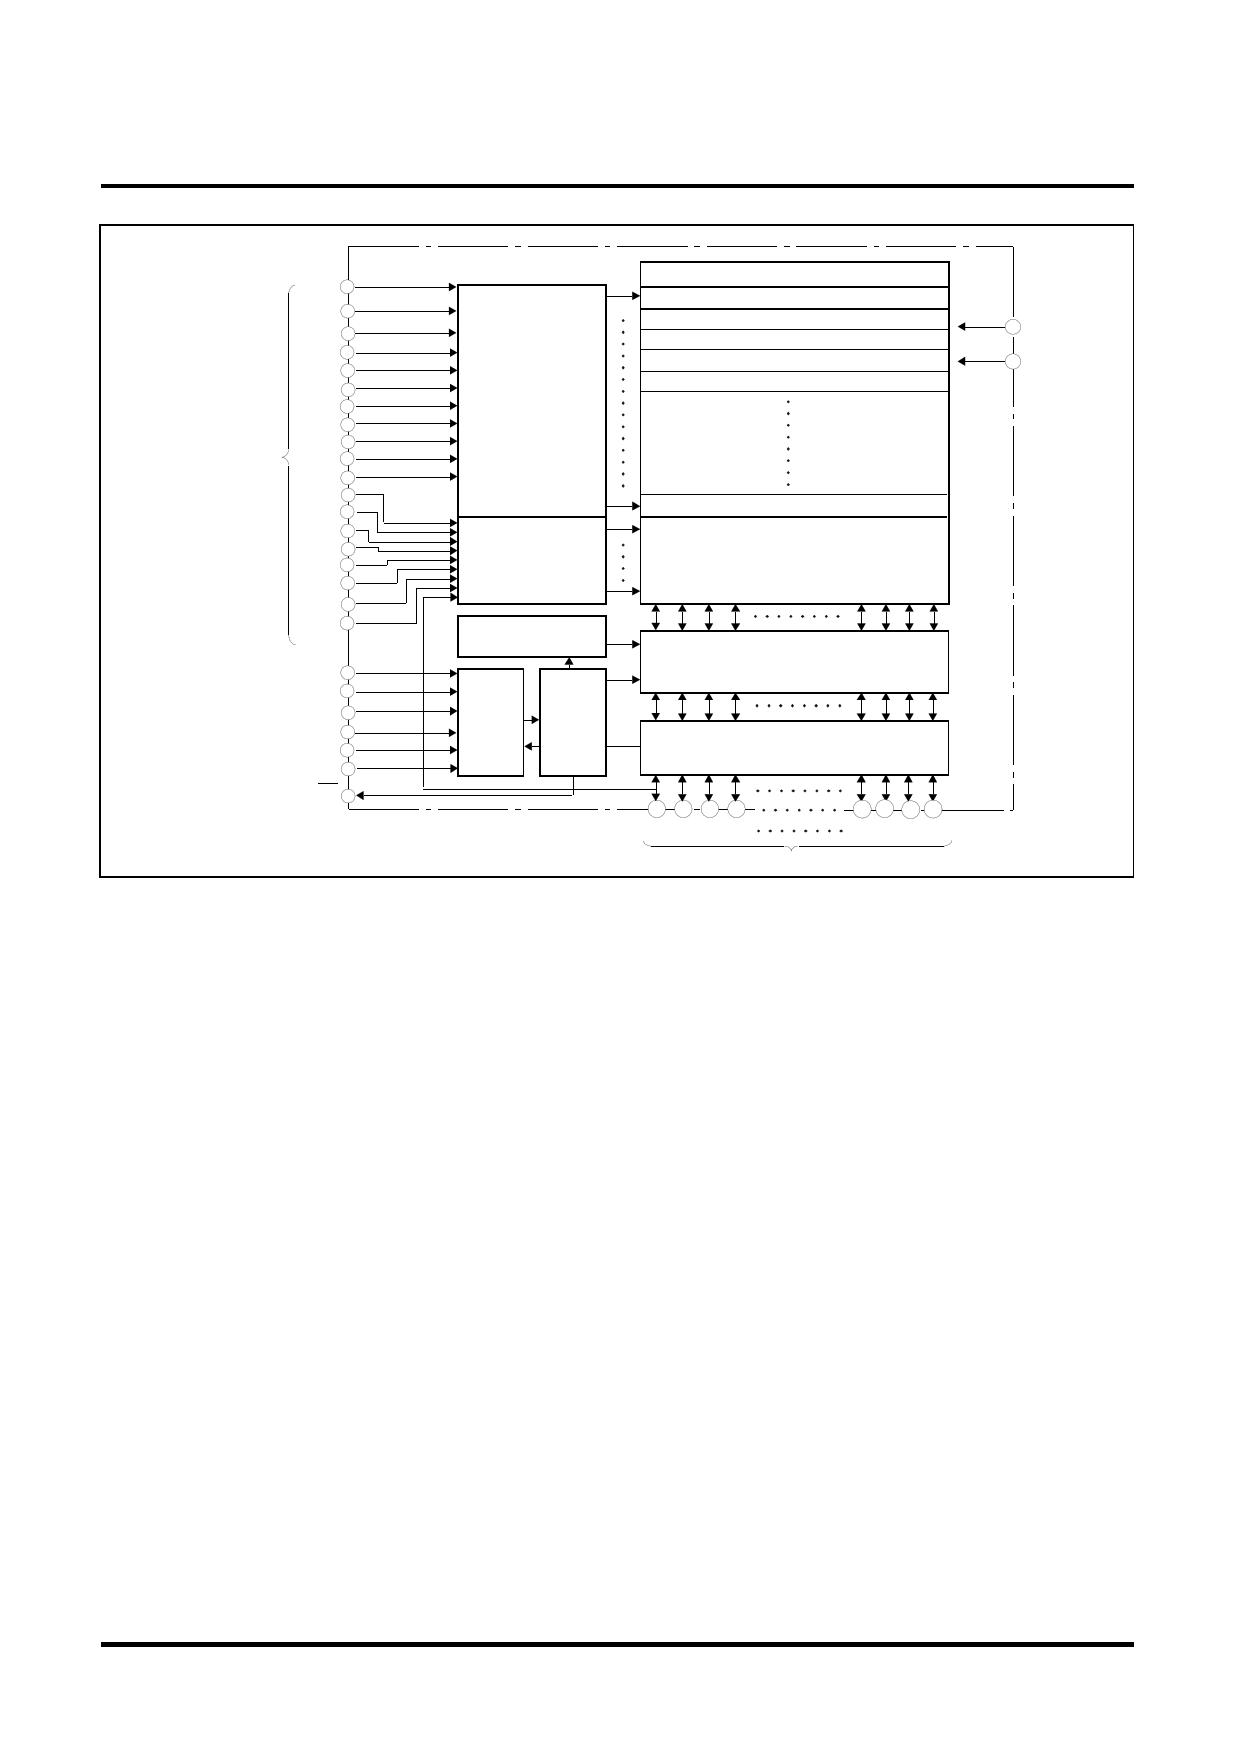 M5M29FB800RV-80 pdf, equivalent, schematic